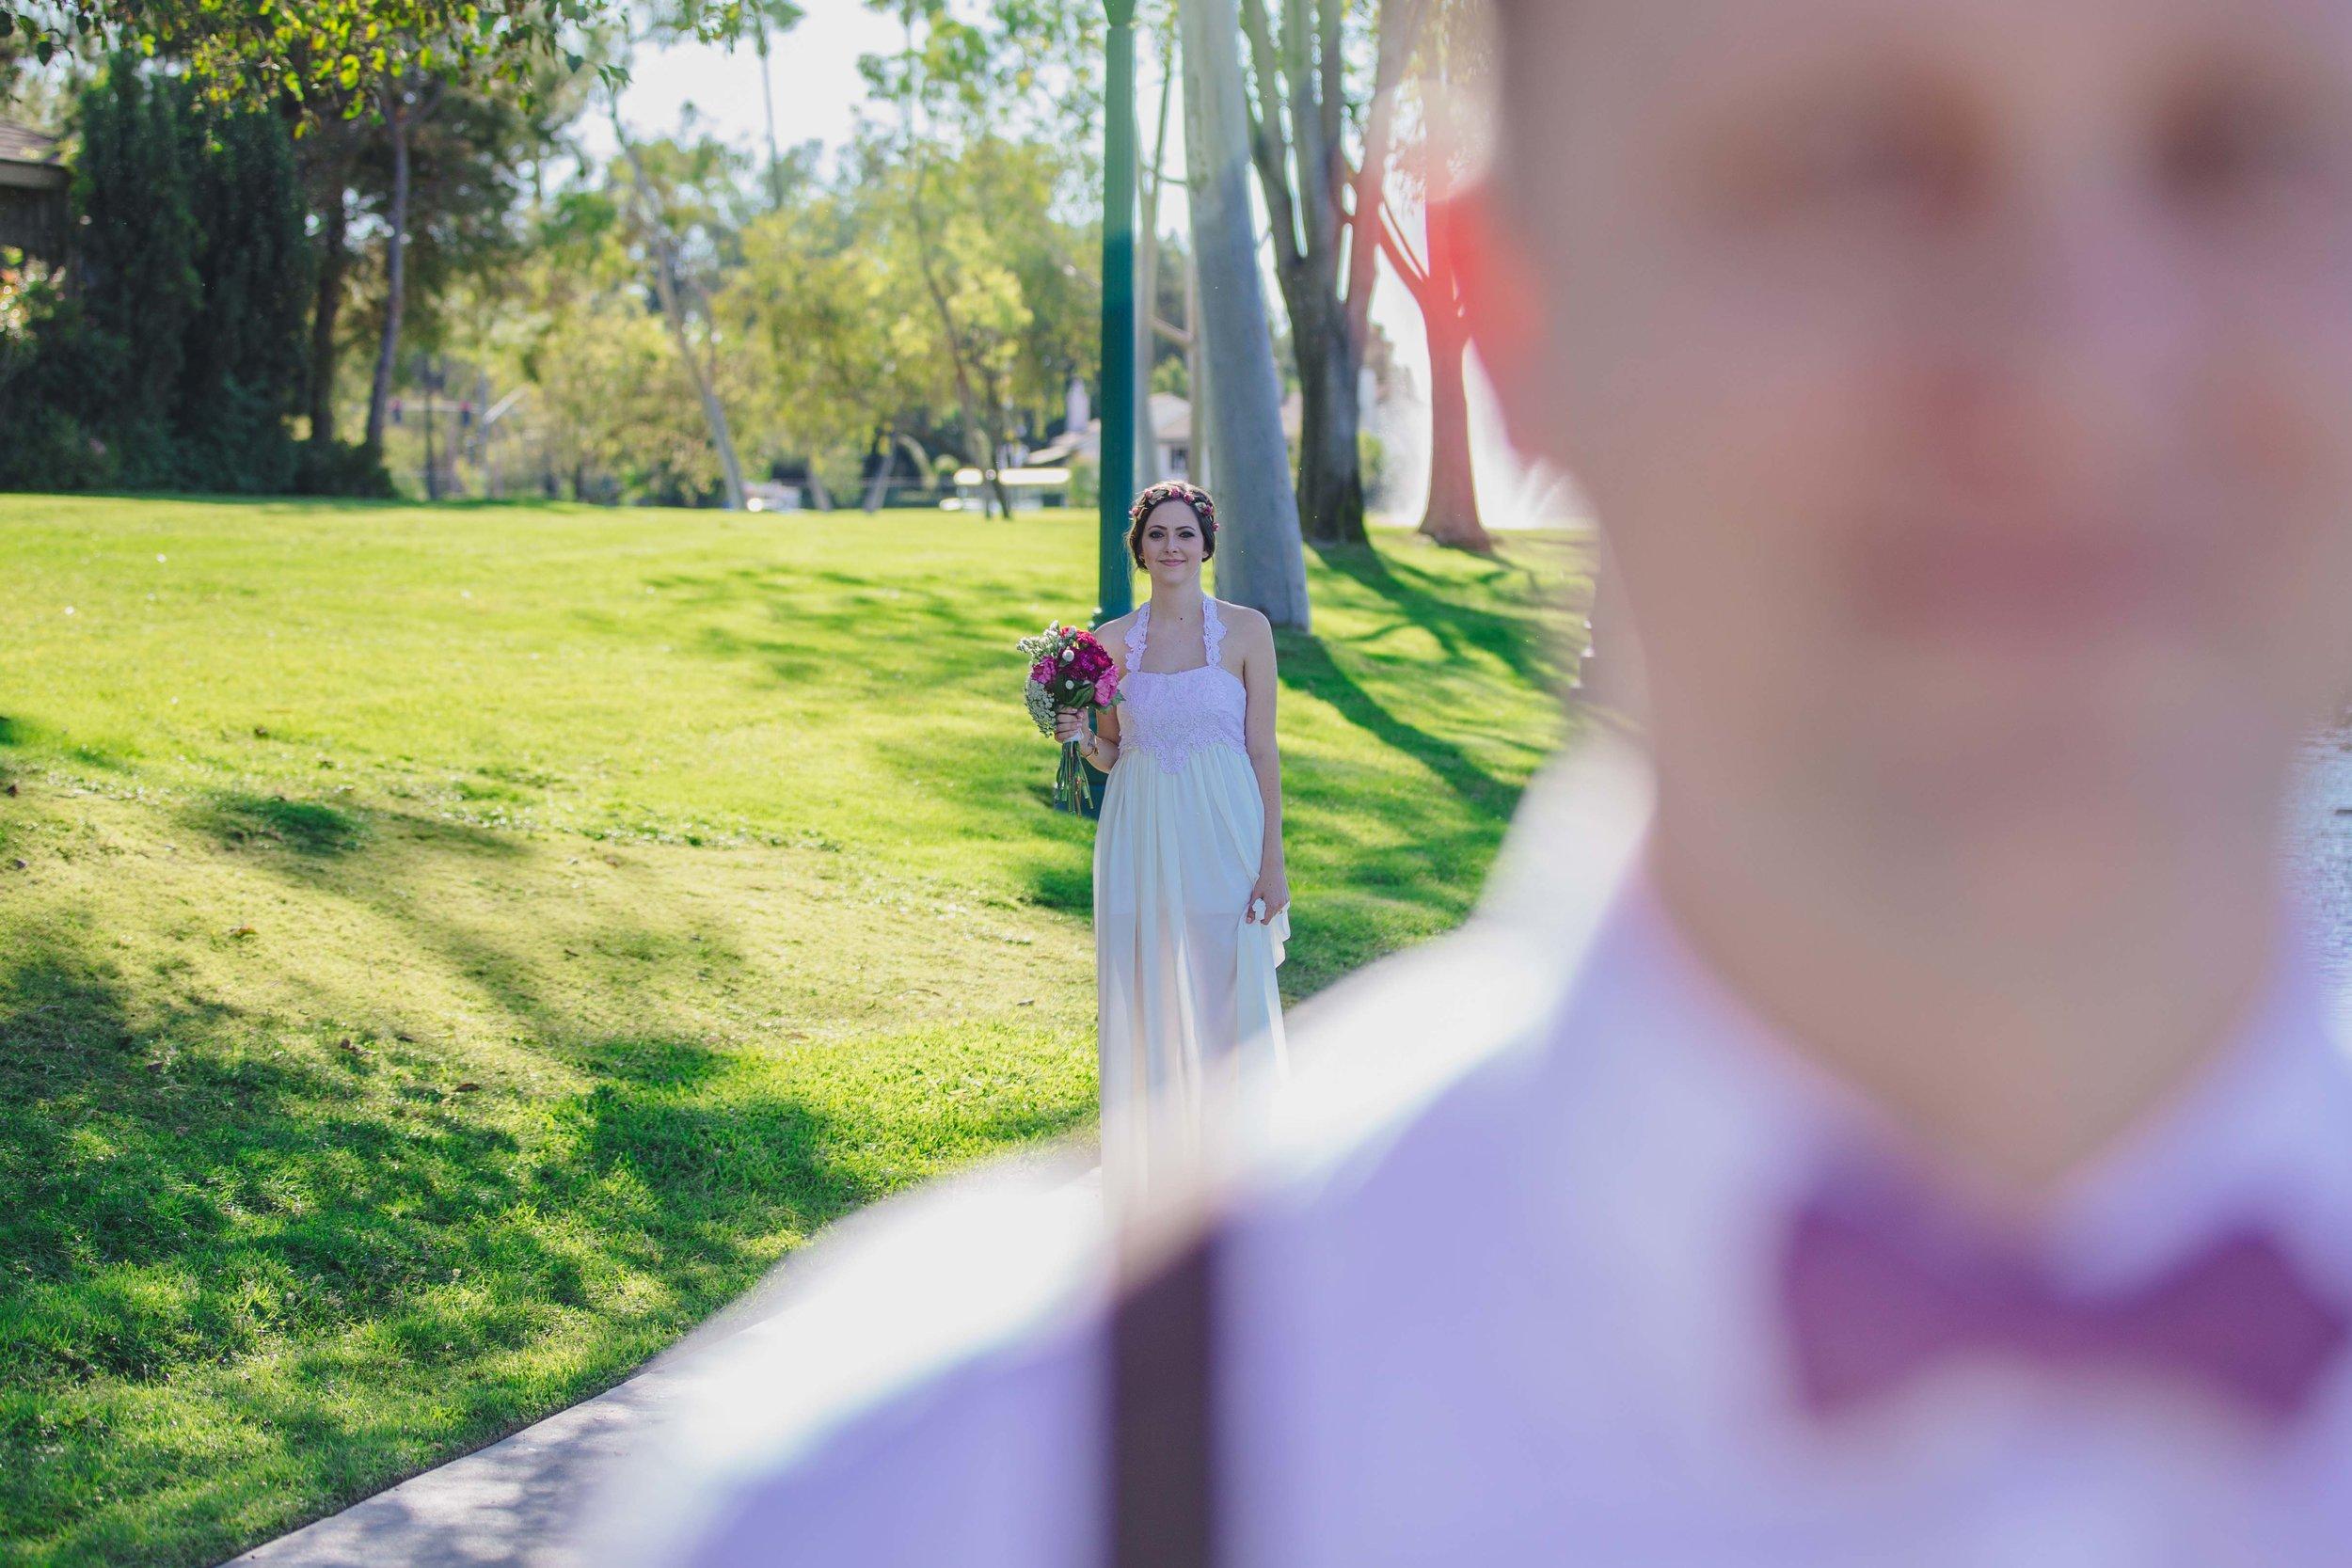 20141024-DePartee-Wedding-APavone-022-sm.jpg